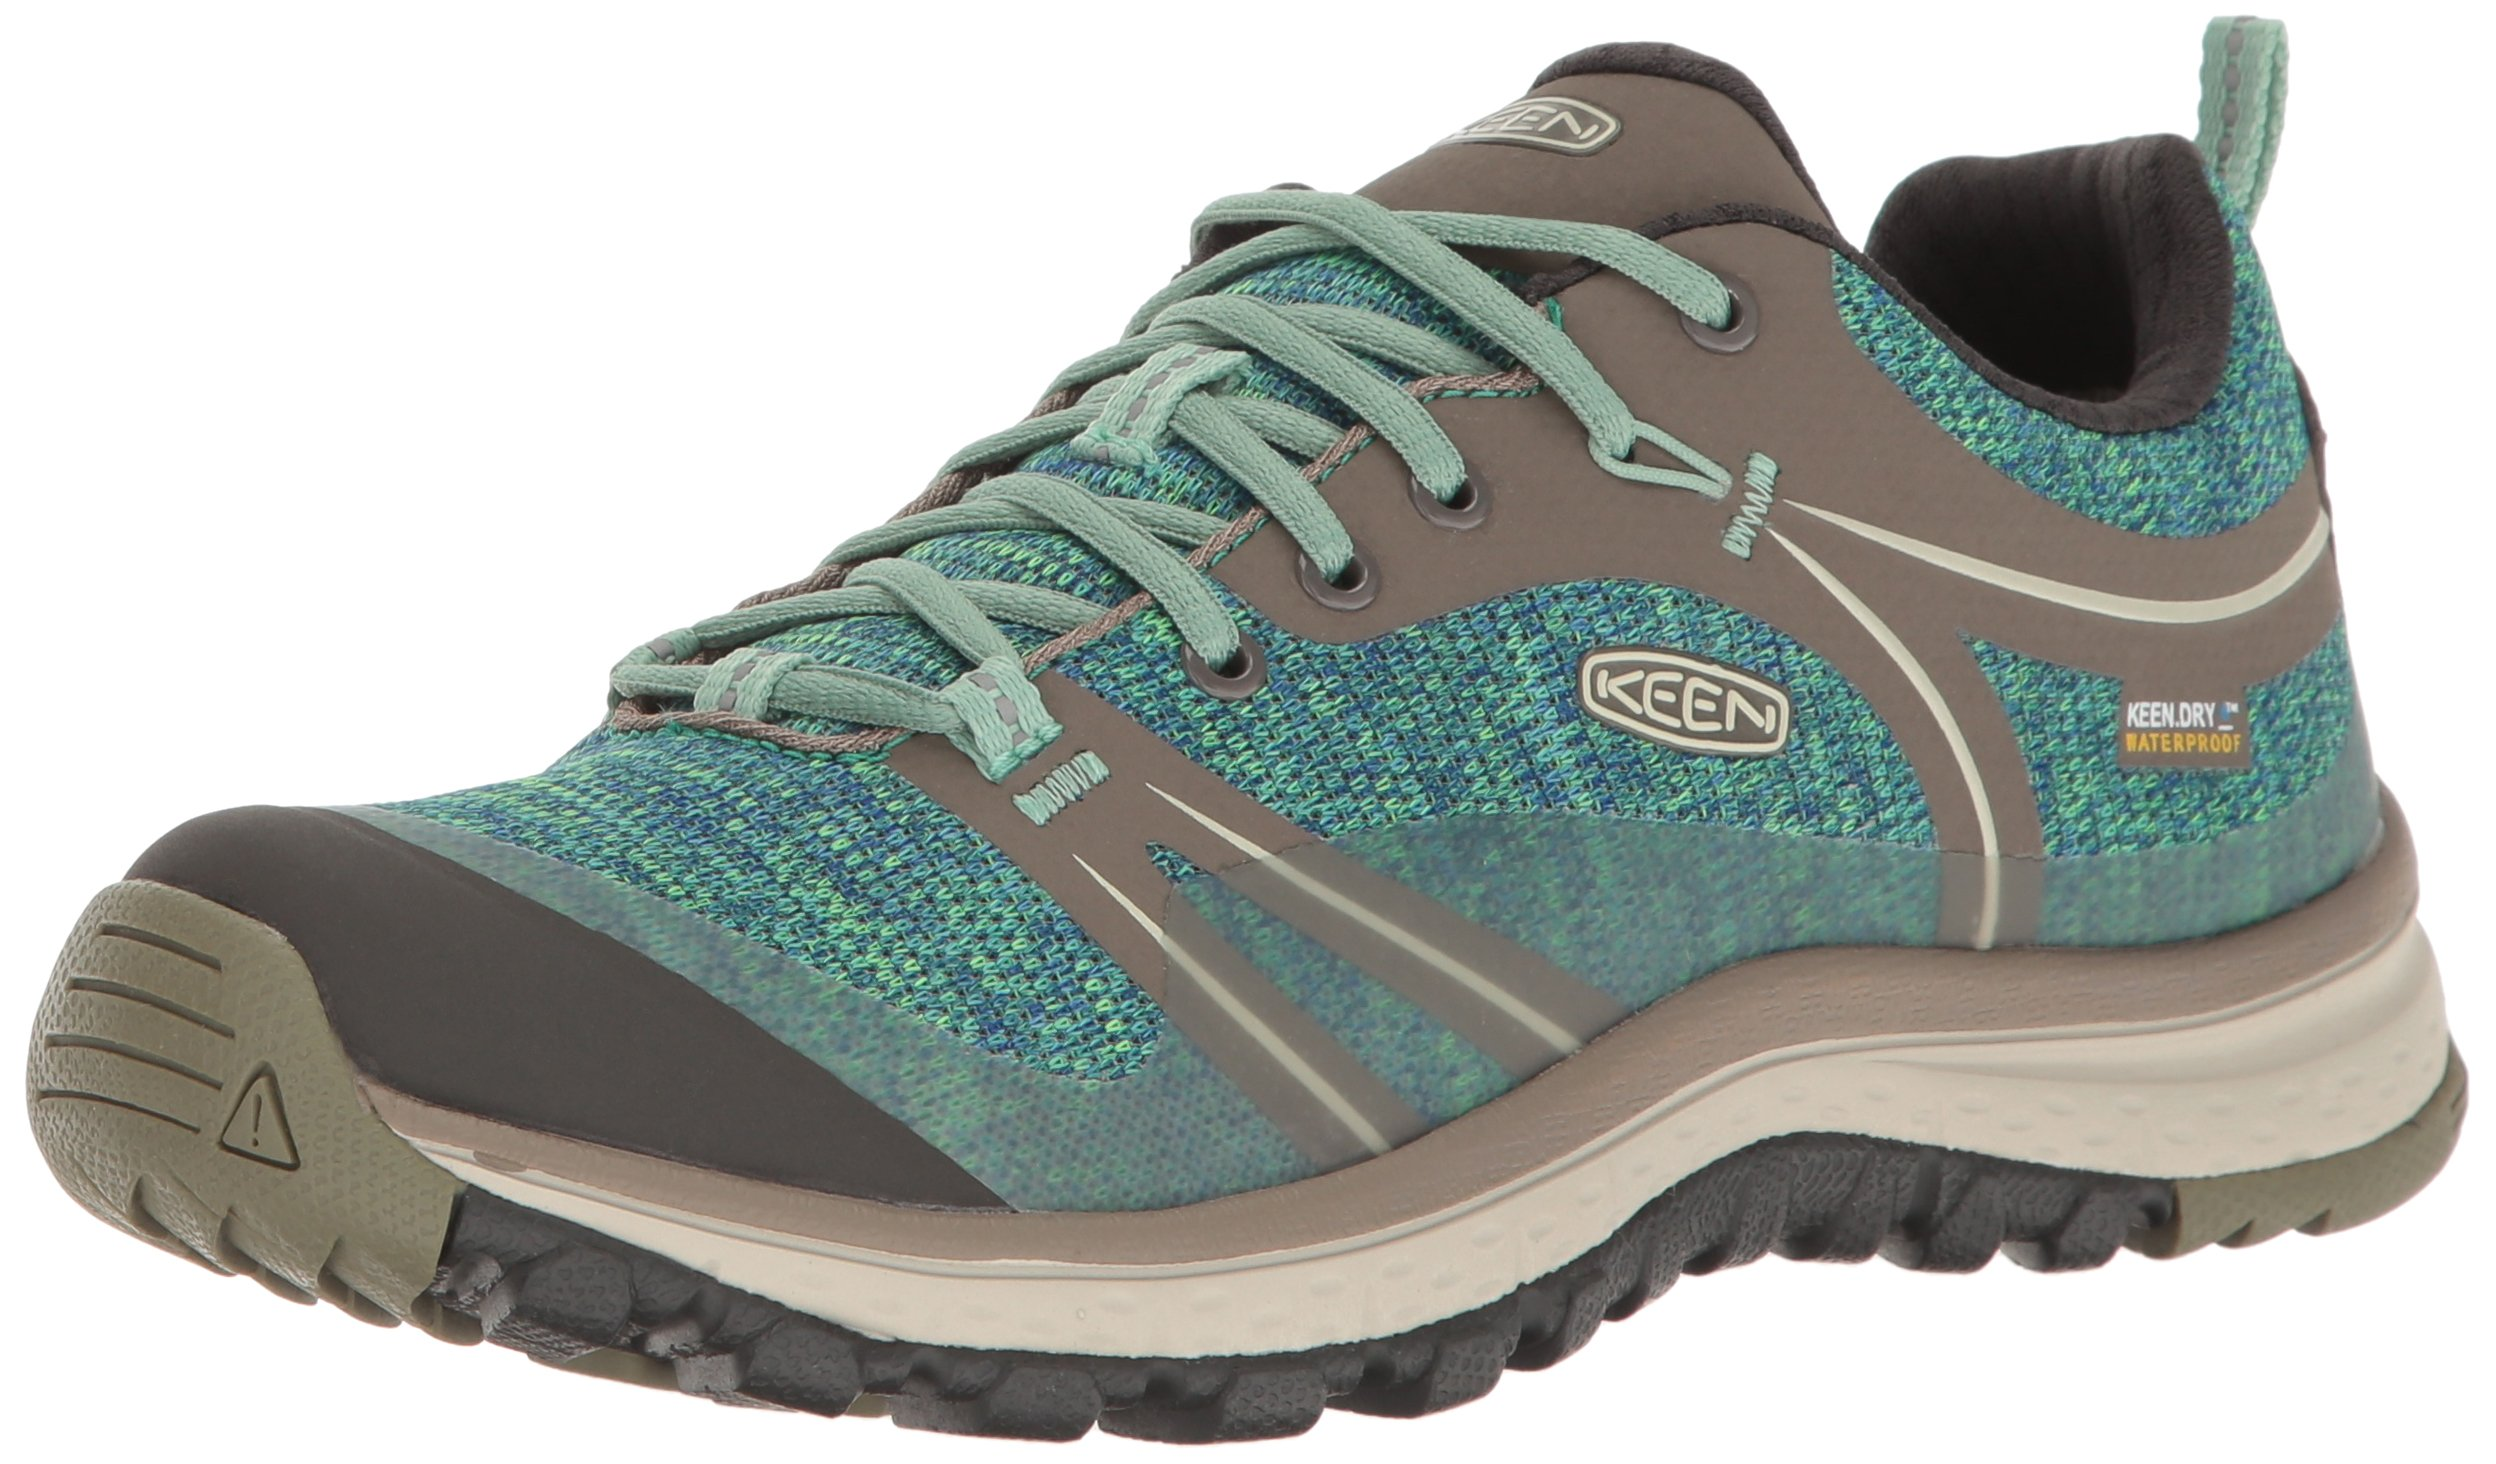 KEEN Women's Terradora Waterproof Hiking Shoe, Bungee Cord/Malachite, 9 M US